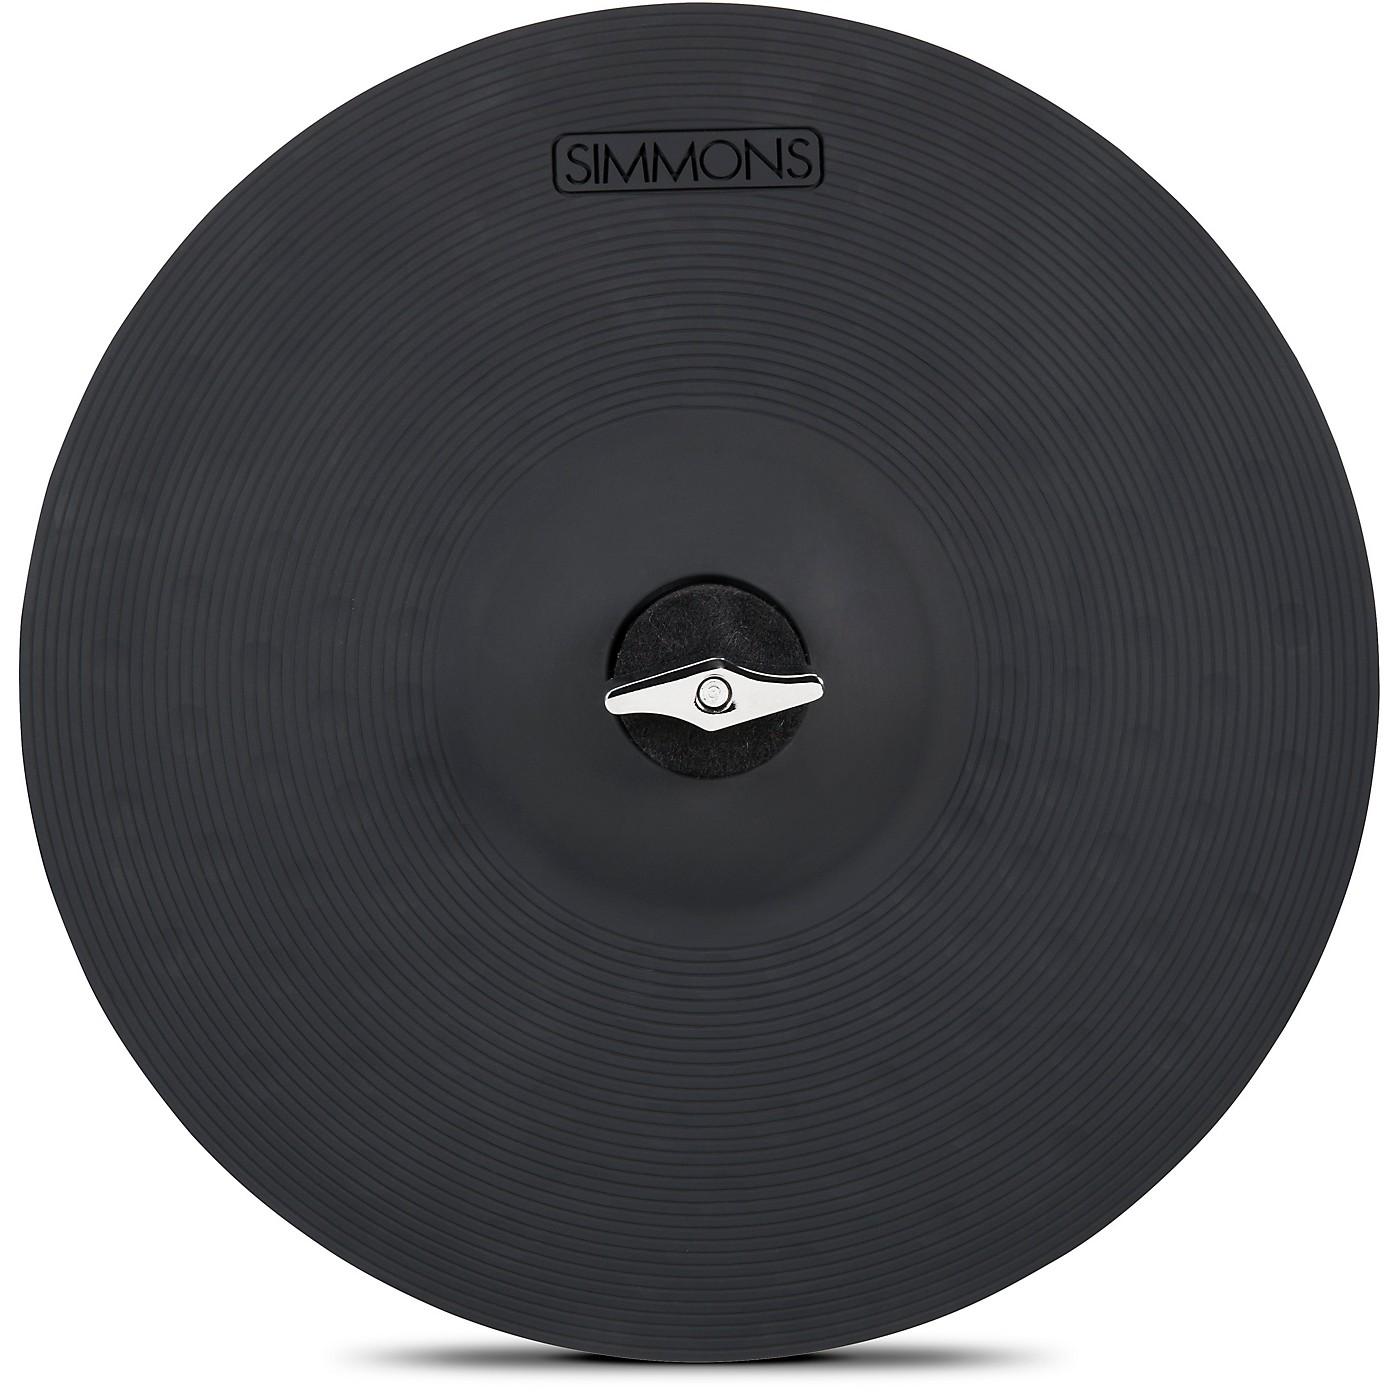 Simmons SD1200 Cymbal Expansion Kit thumbnail